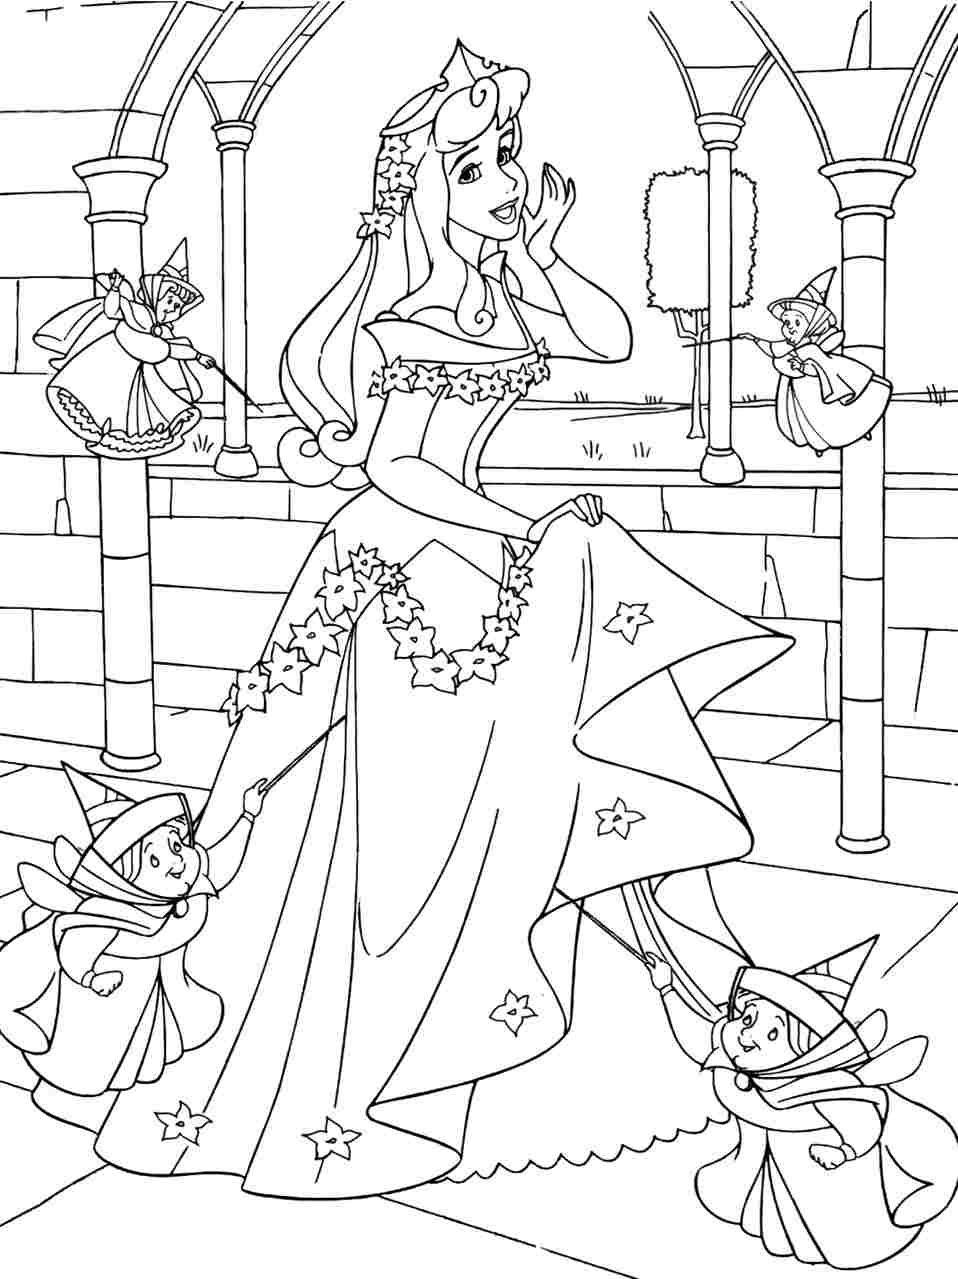 Disney Princess Sleeping Beauty Aurora Colouring Sheets Printable Free For Preschoo Princess Coloring Pages Sleeping Beauty Coloring Pages Fairy Coloring Pages